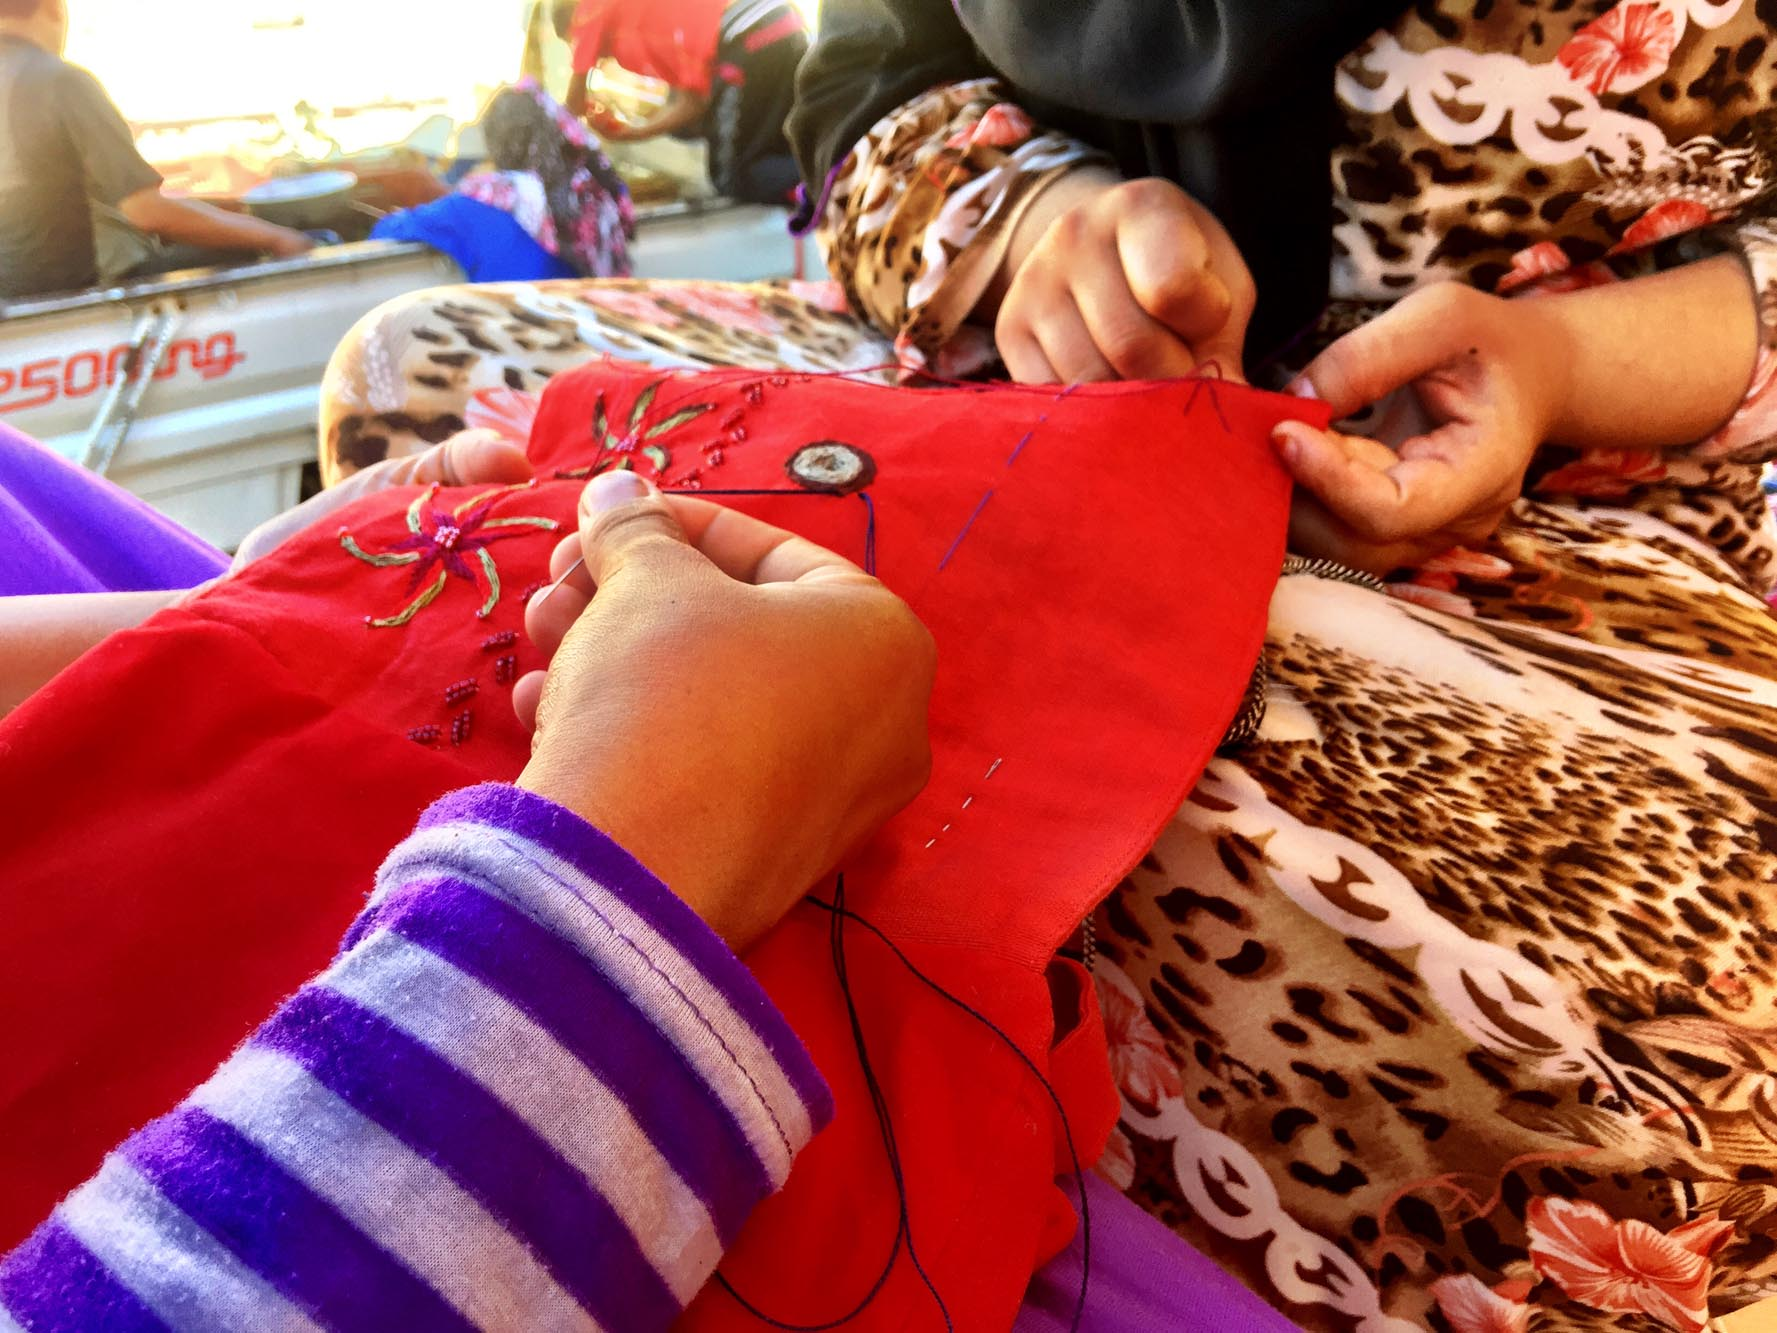 Bedouin women embroidering crafts